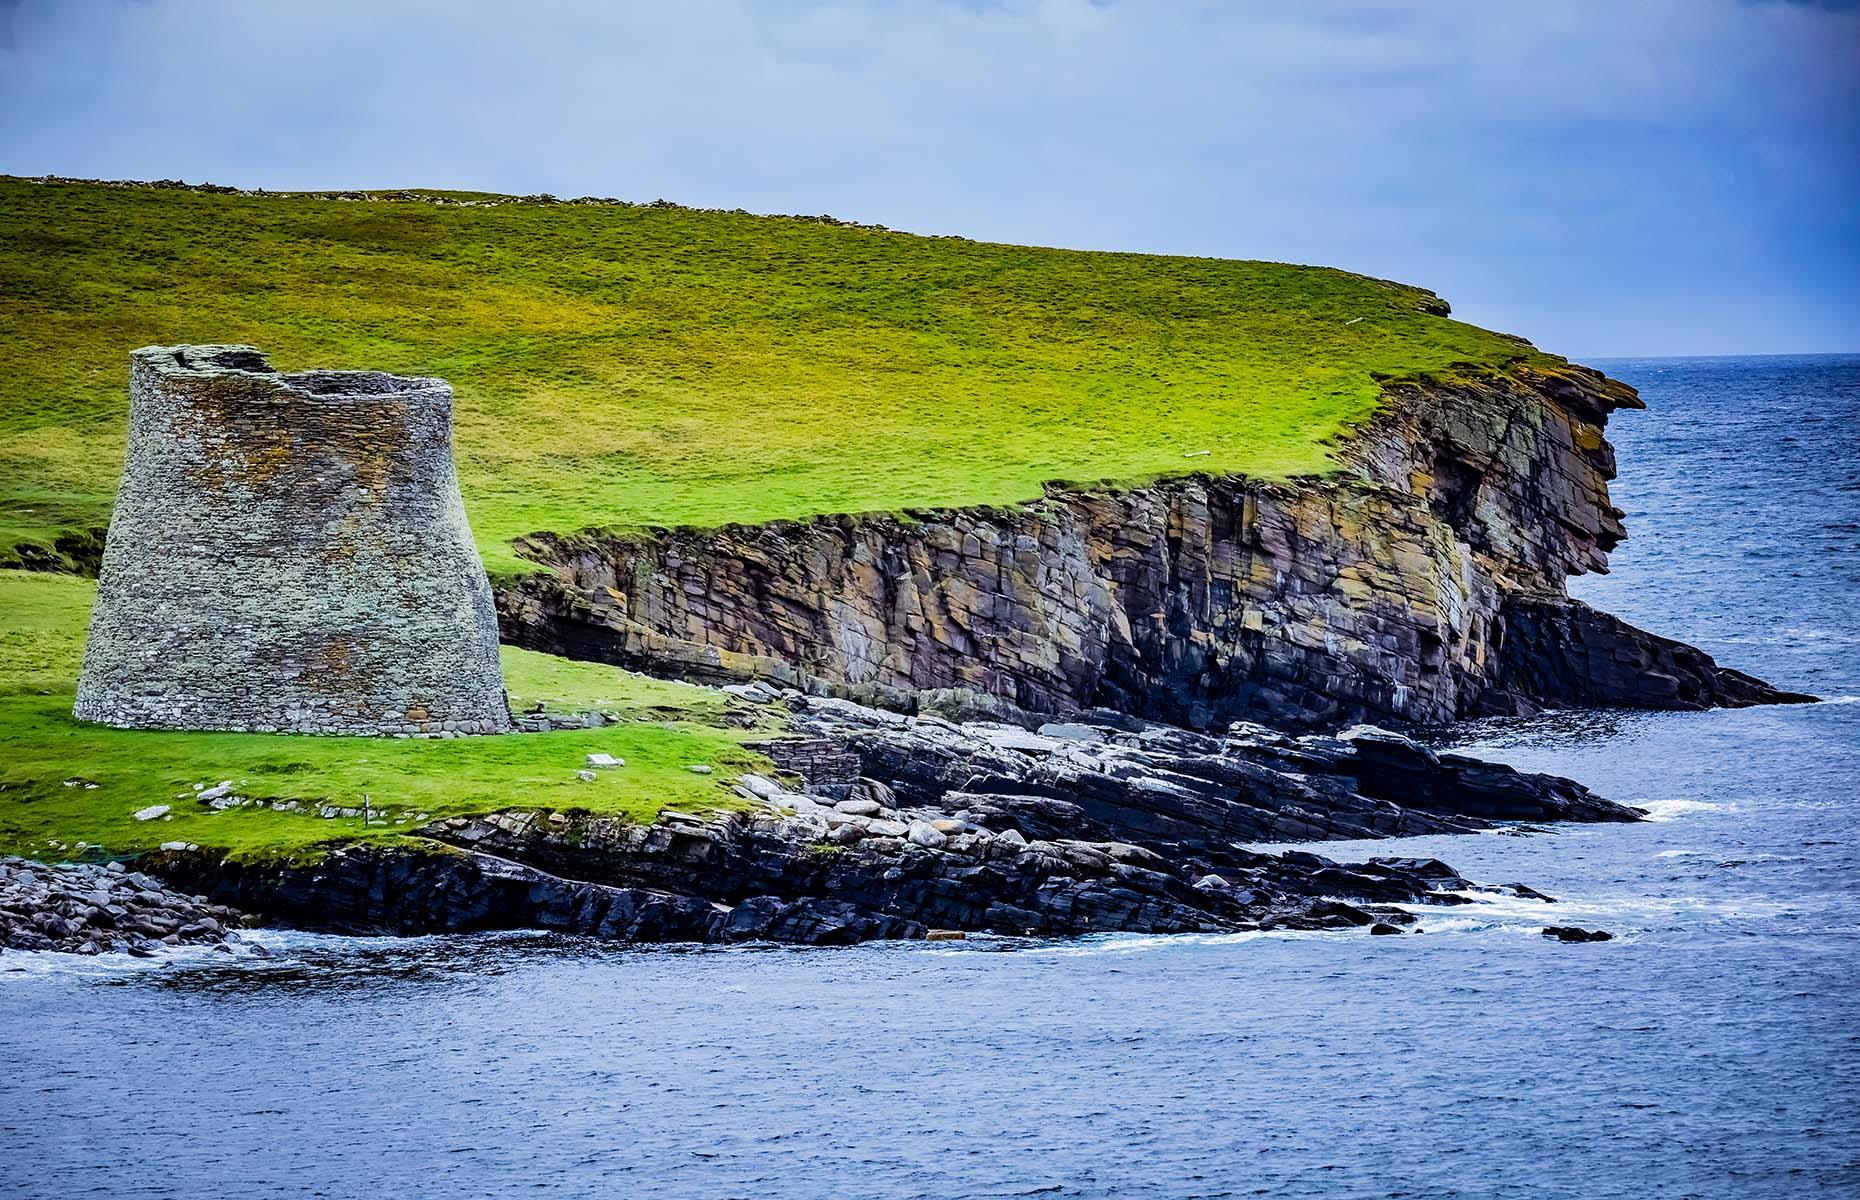 Mousa Broch in Scotland (Image: Marcin Kadziolka/Shutterstock)